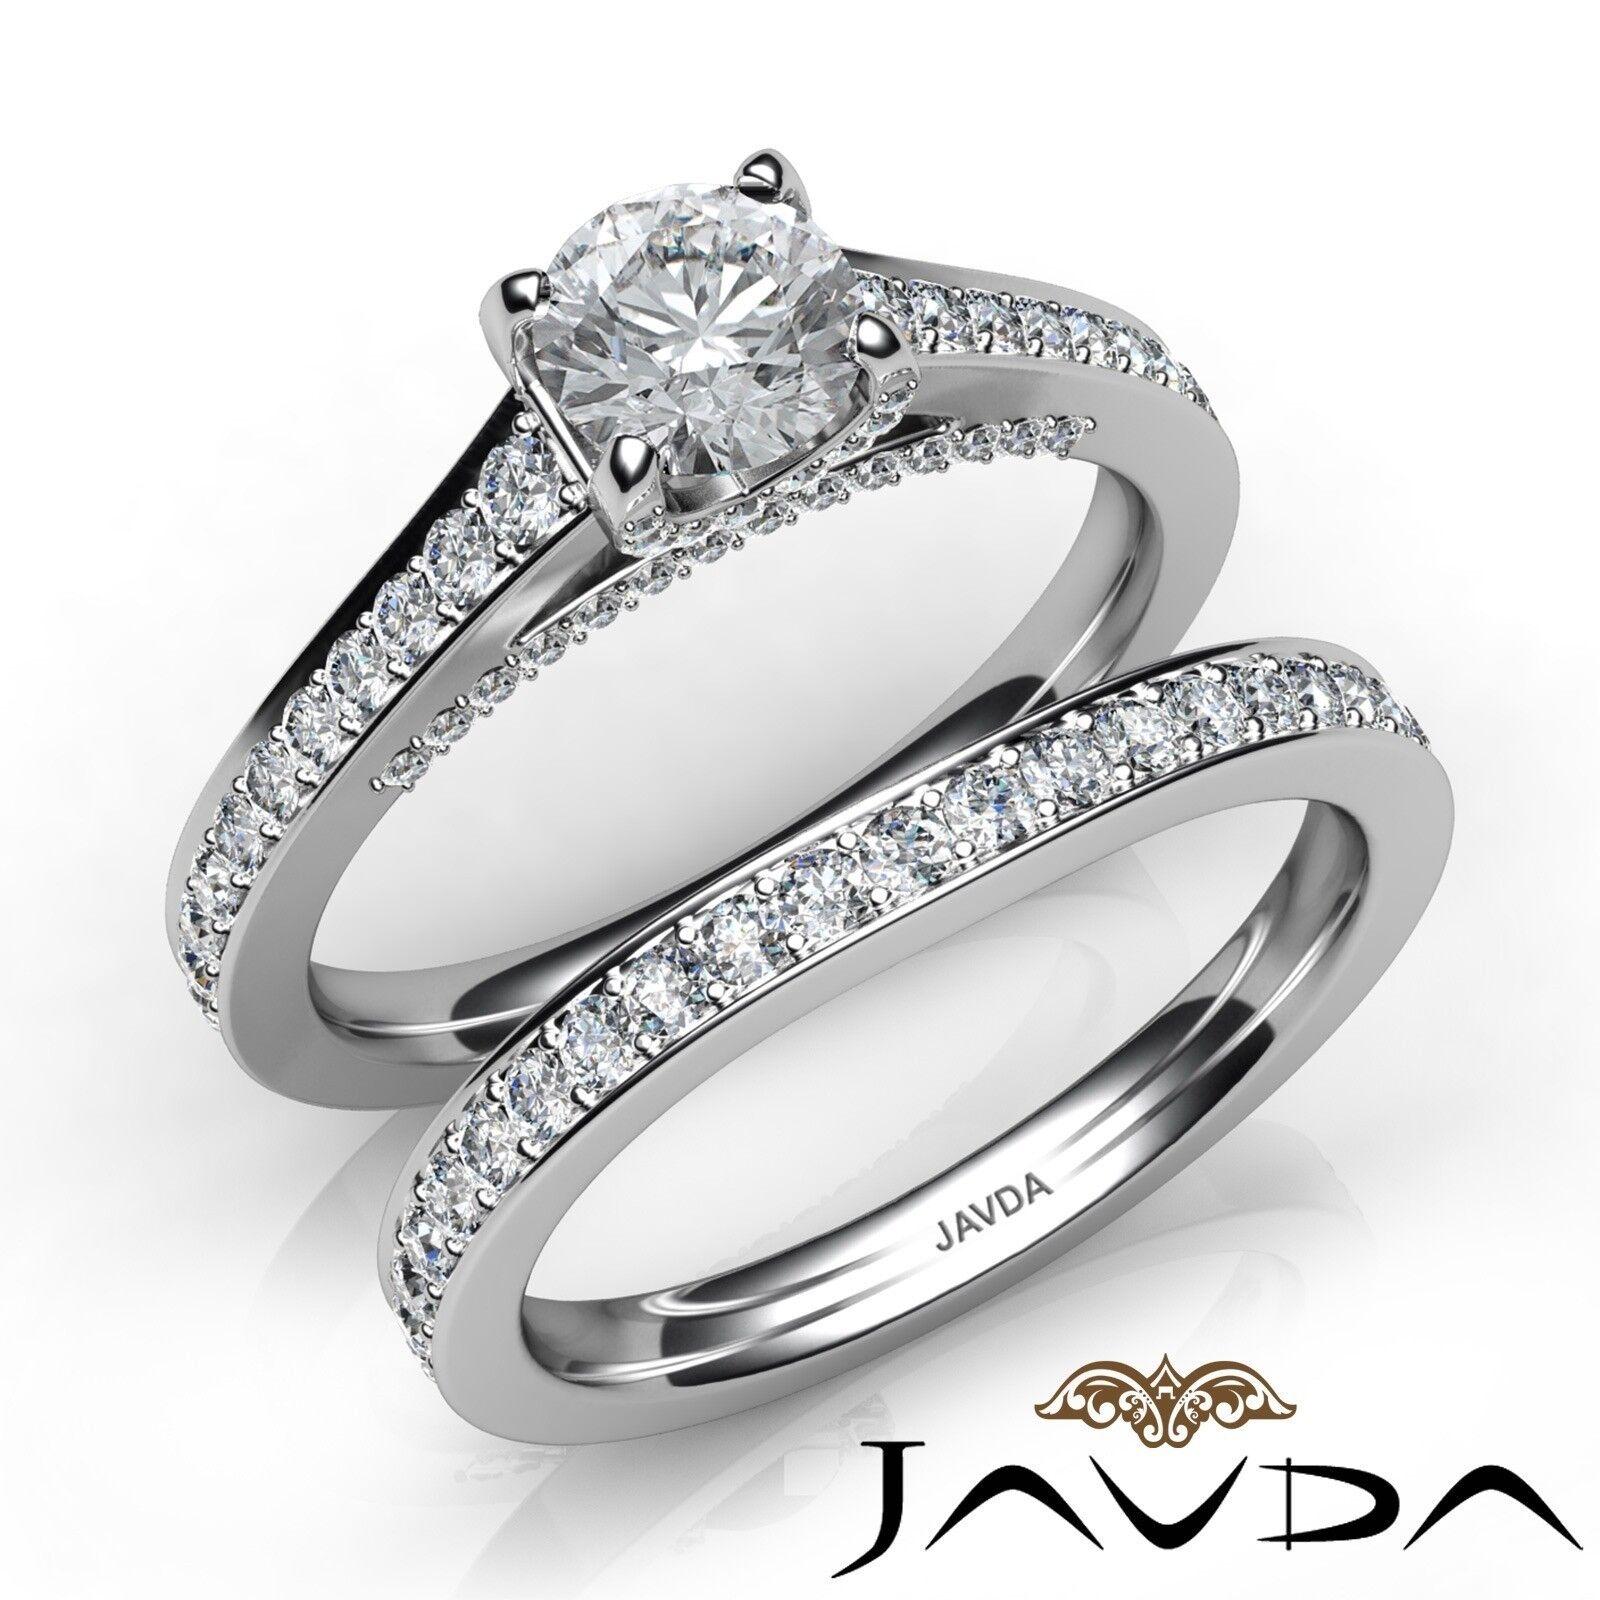 1.75ctw Pave Classic Bridal Set Round Diamond Engagement Ring GIA G-VVS1 W Gold